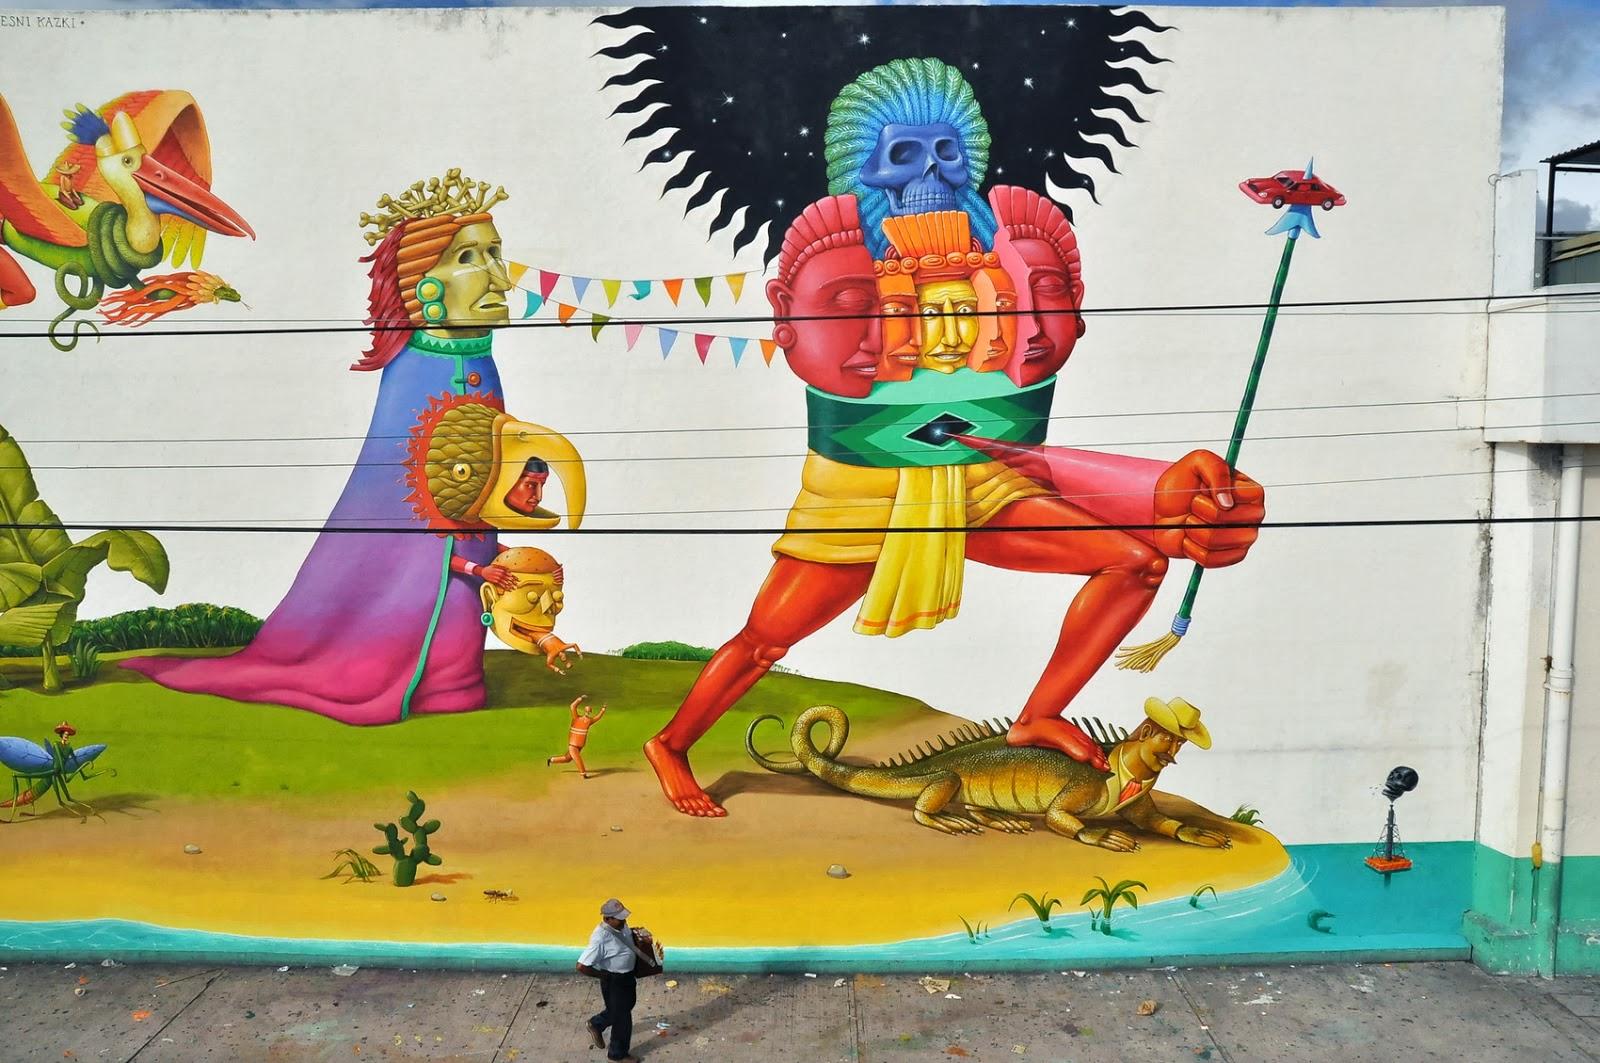 interesni-kazki-new-mural-campeche-mexico-05